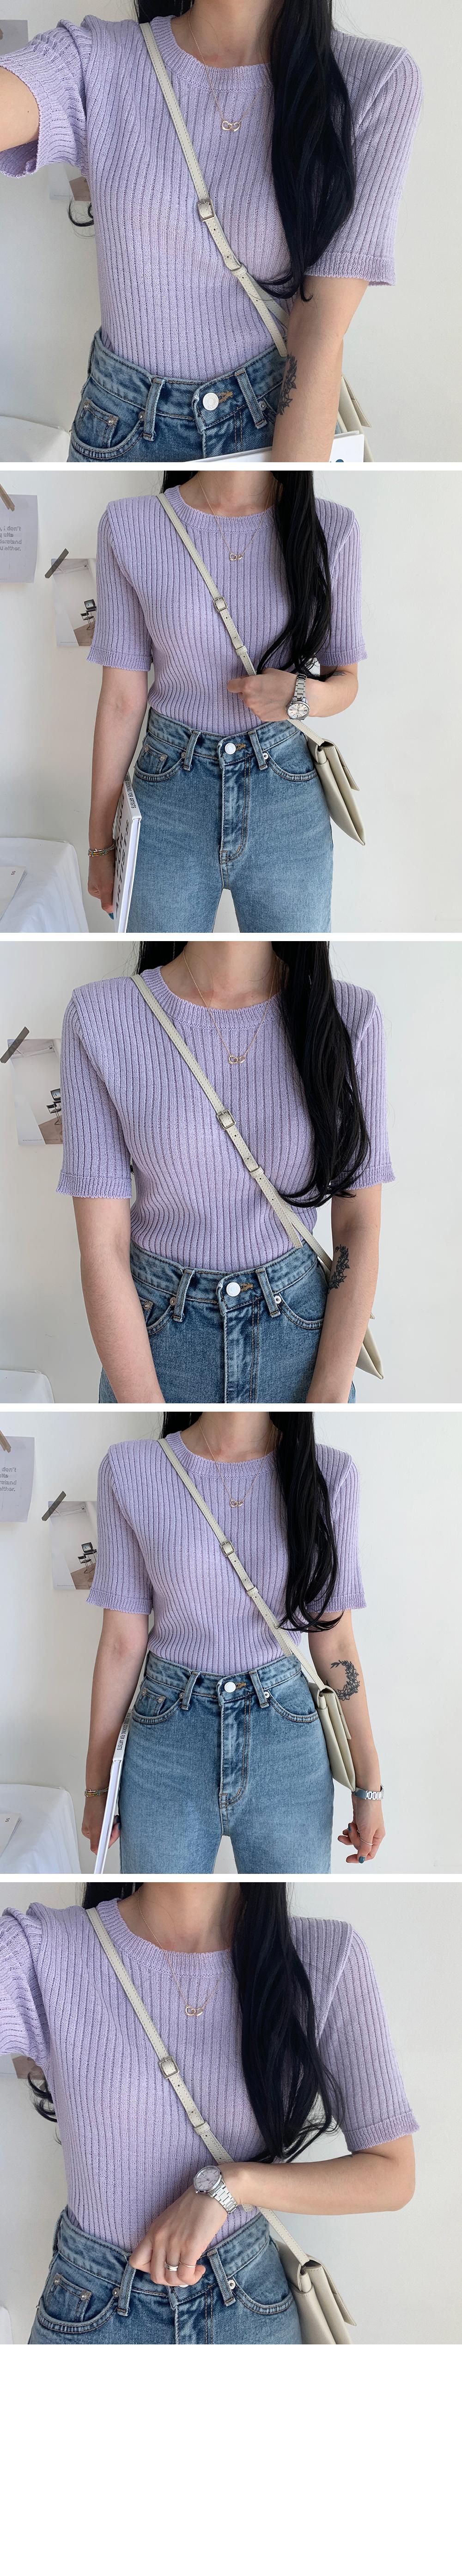 Queen Ribbed Knitwear Short Sleeve